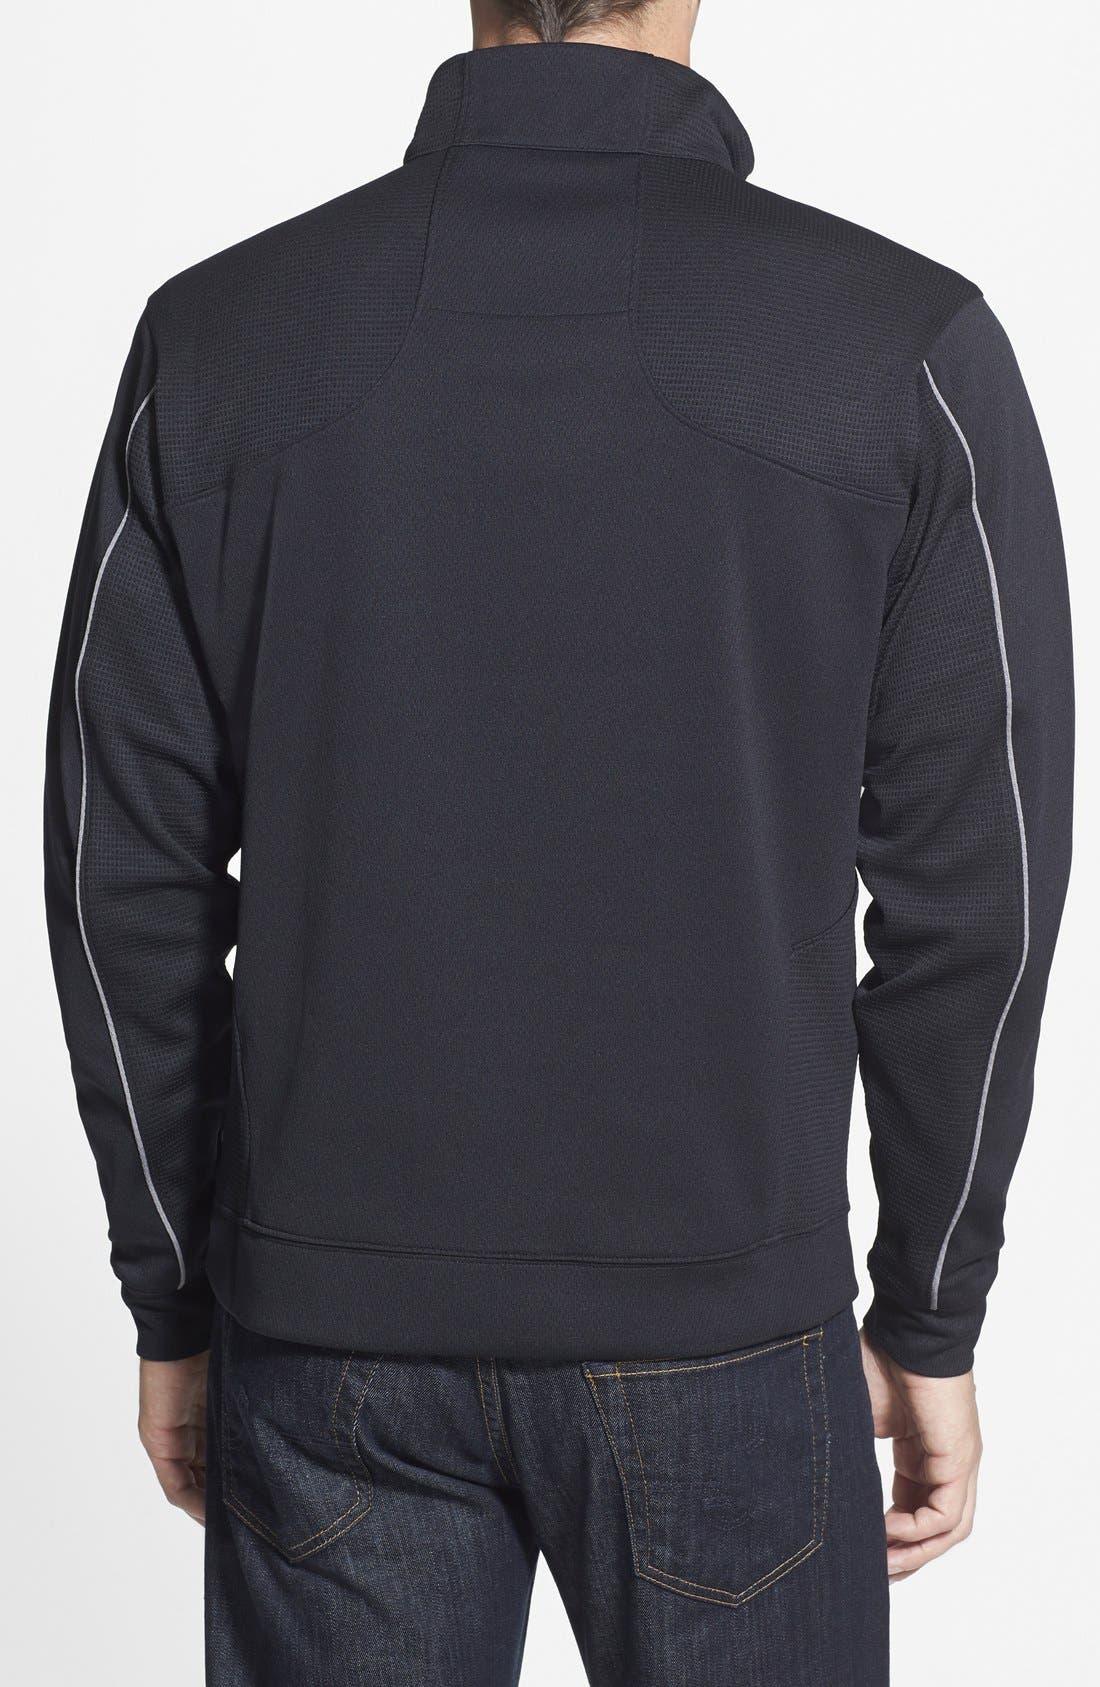 New Orleans Saints - Edge DryTec Moisture Wicking Half Zip Pullover,                             Alternate thumbnail 2, color,                             Black